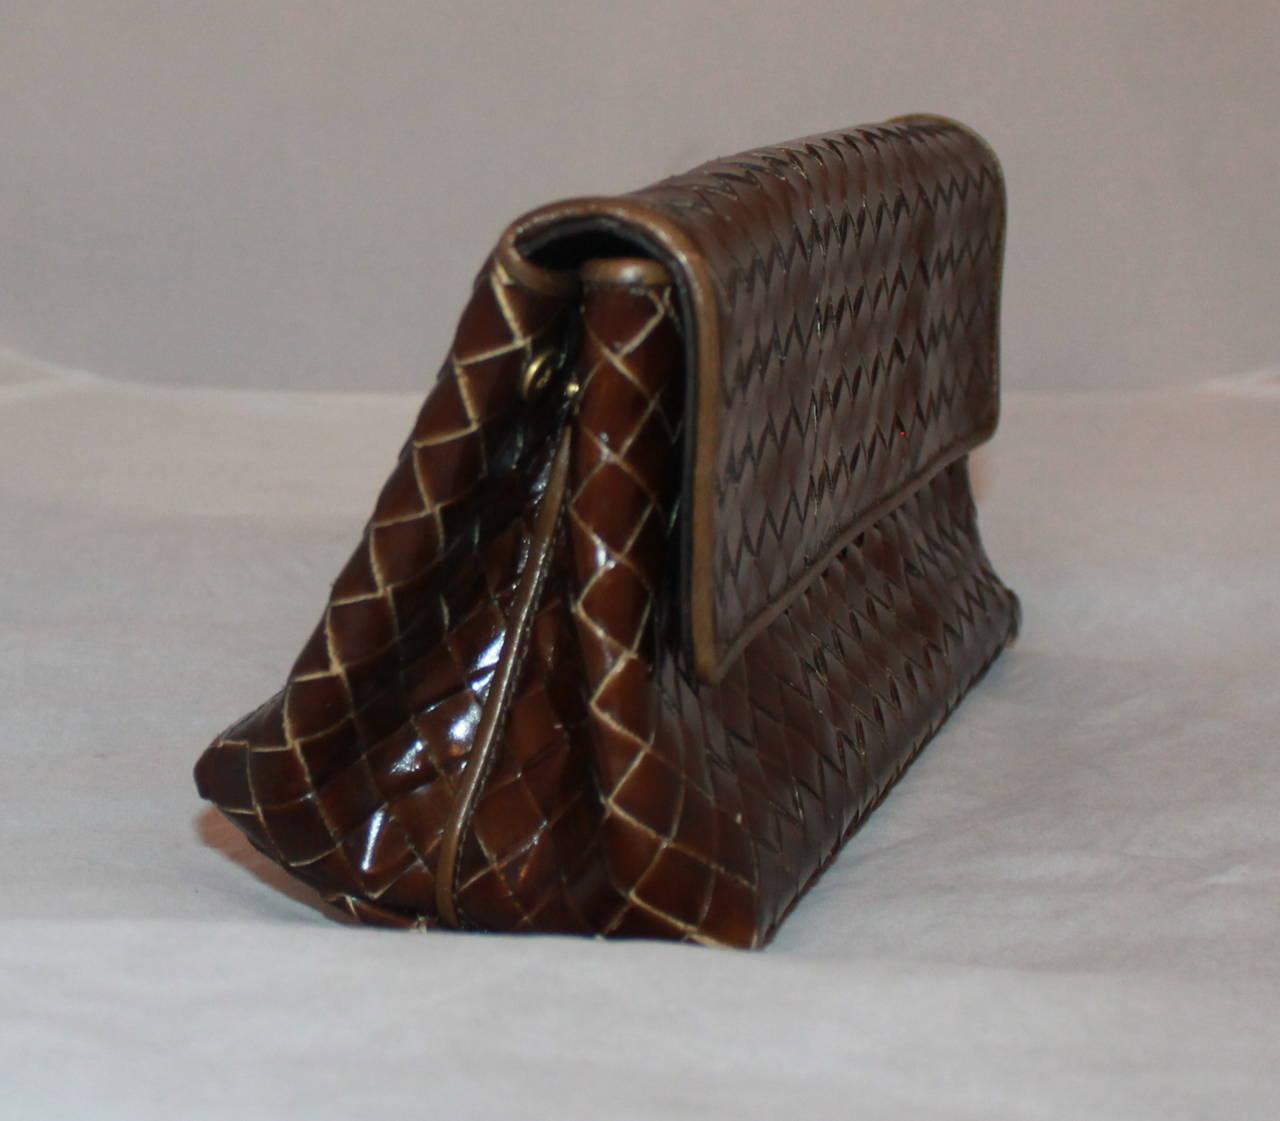 Bottega Veneta Bronze & Brown Braided Leather Clutch 3